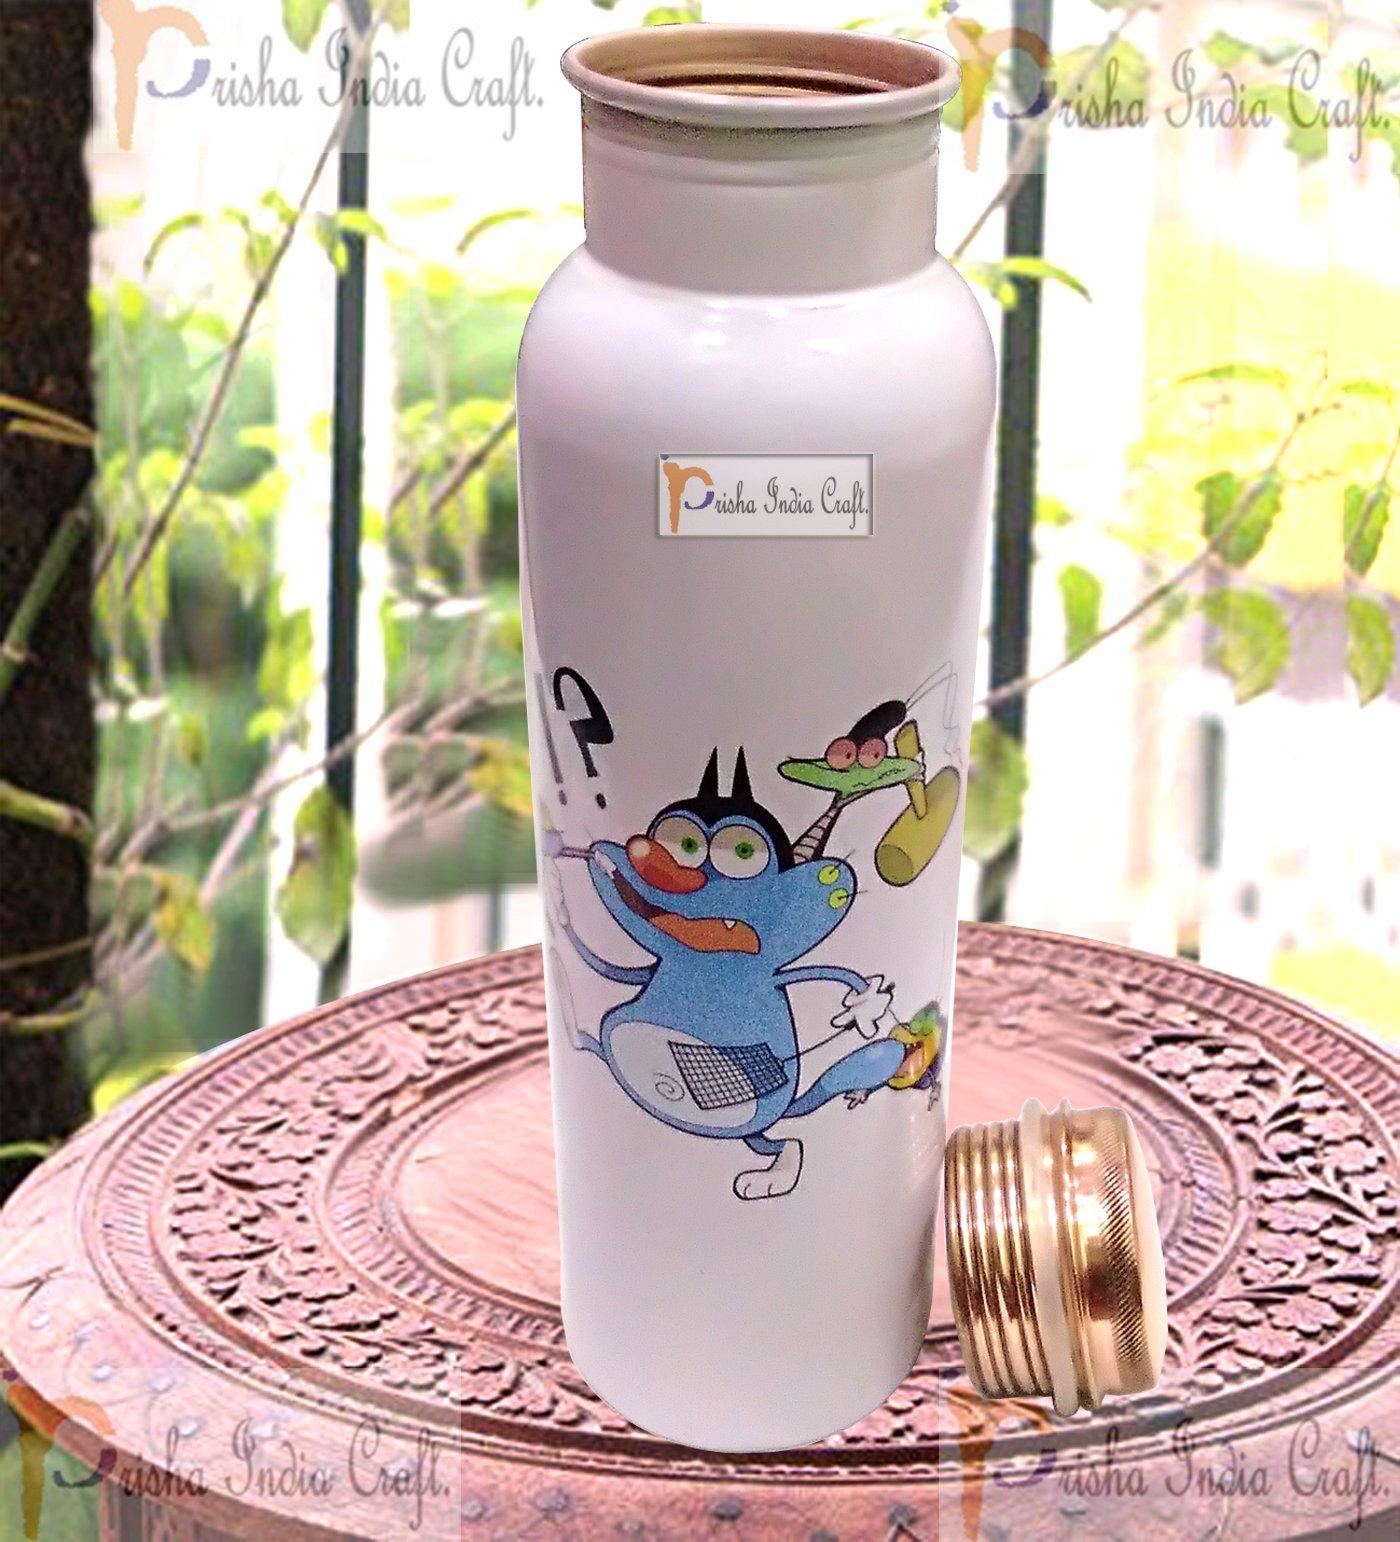 Prisha India Craft Digital Printed Pure Copper Water Bottle Kids School Water Bottle - Oggy Design, 1000 ML